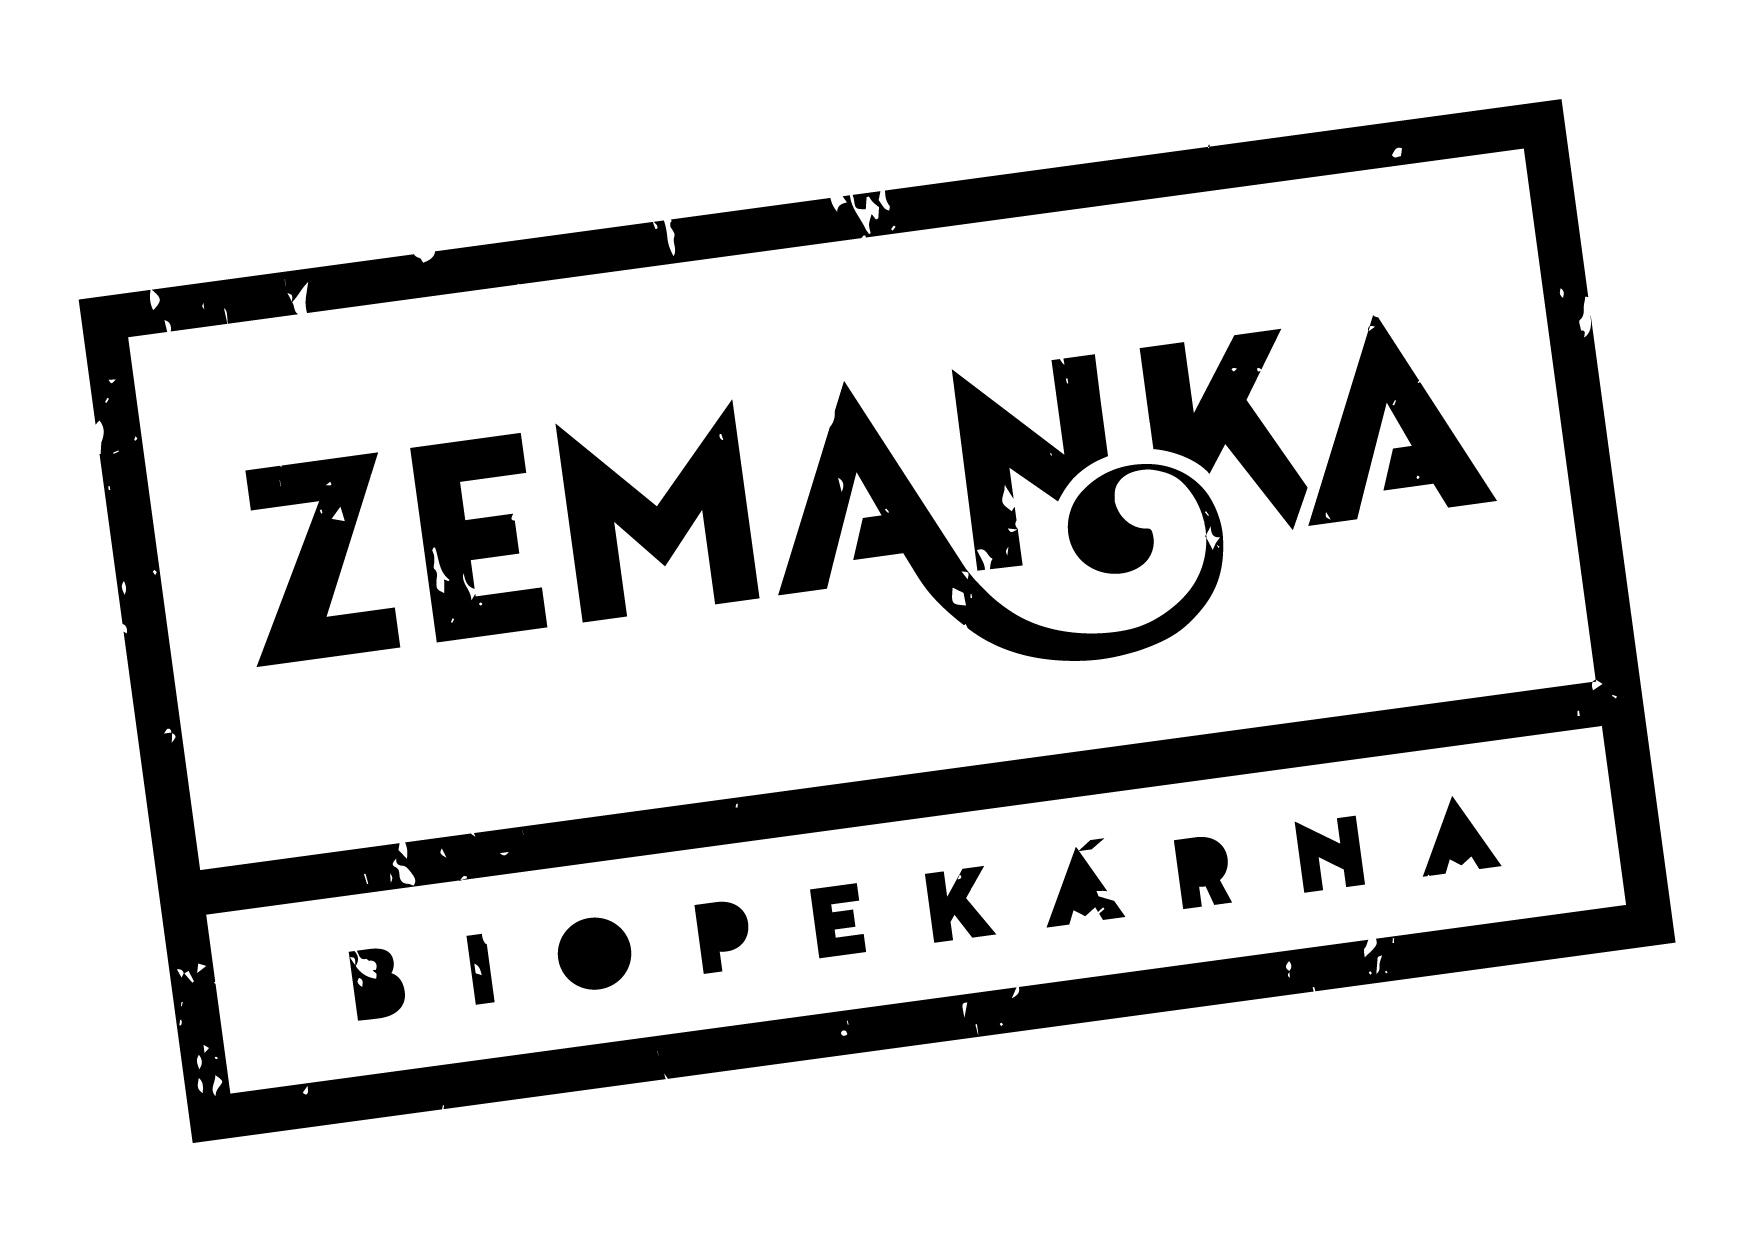 Zemanka_loga_BLACK_BIOPEKARNA_sikme.jpg